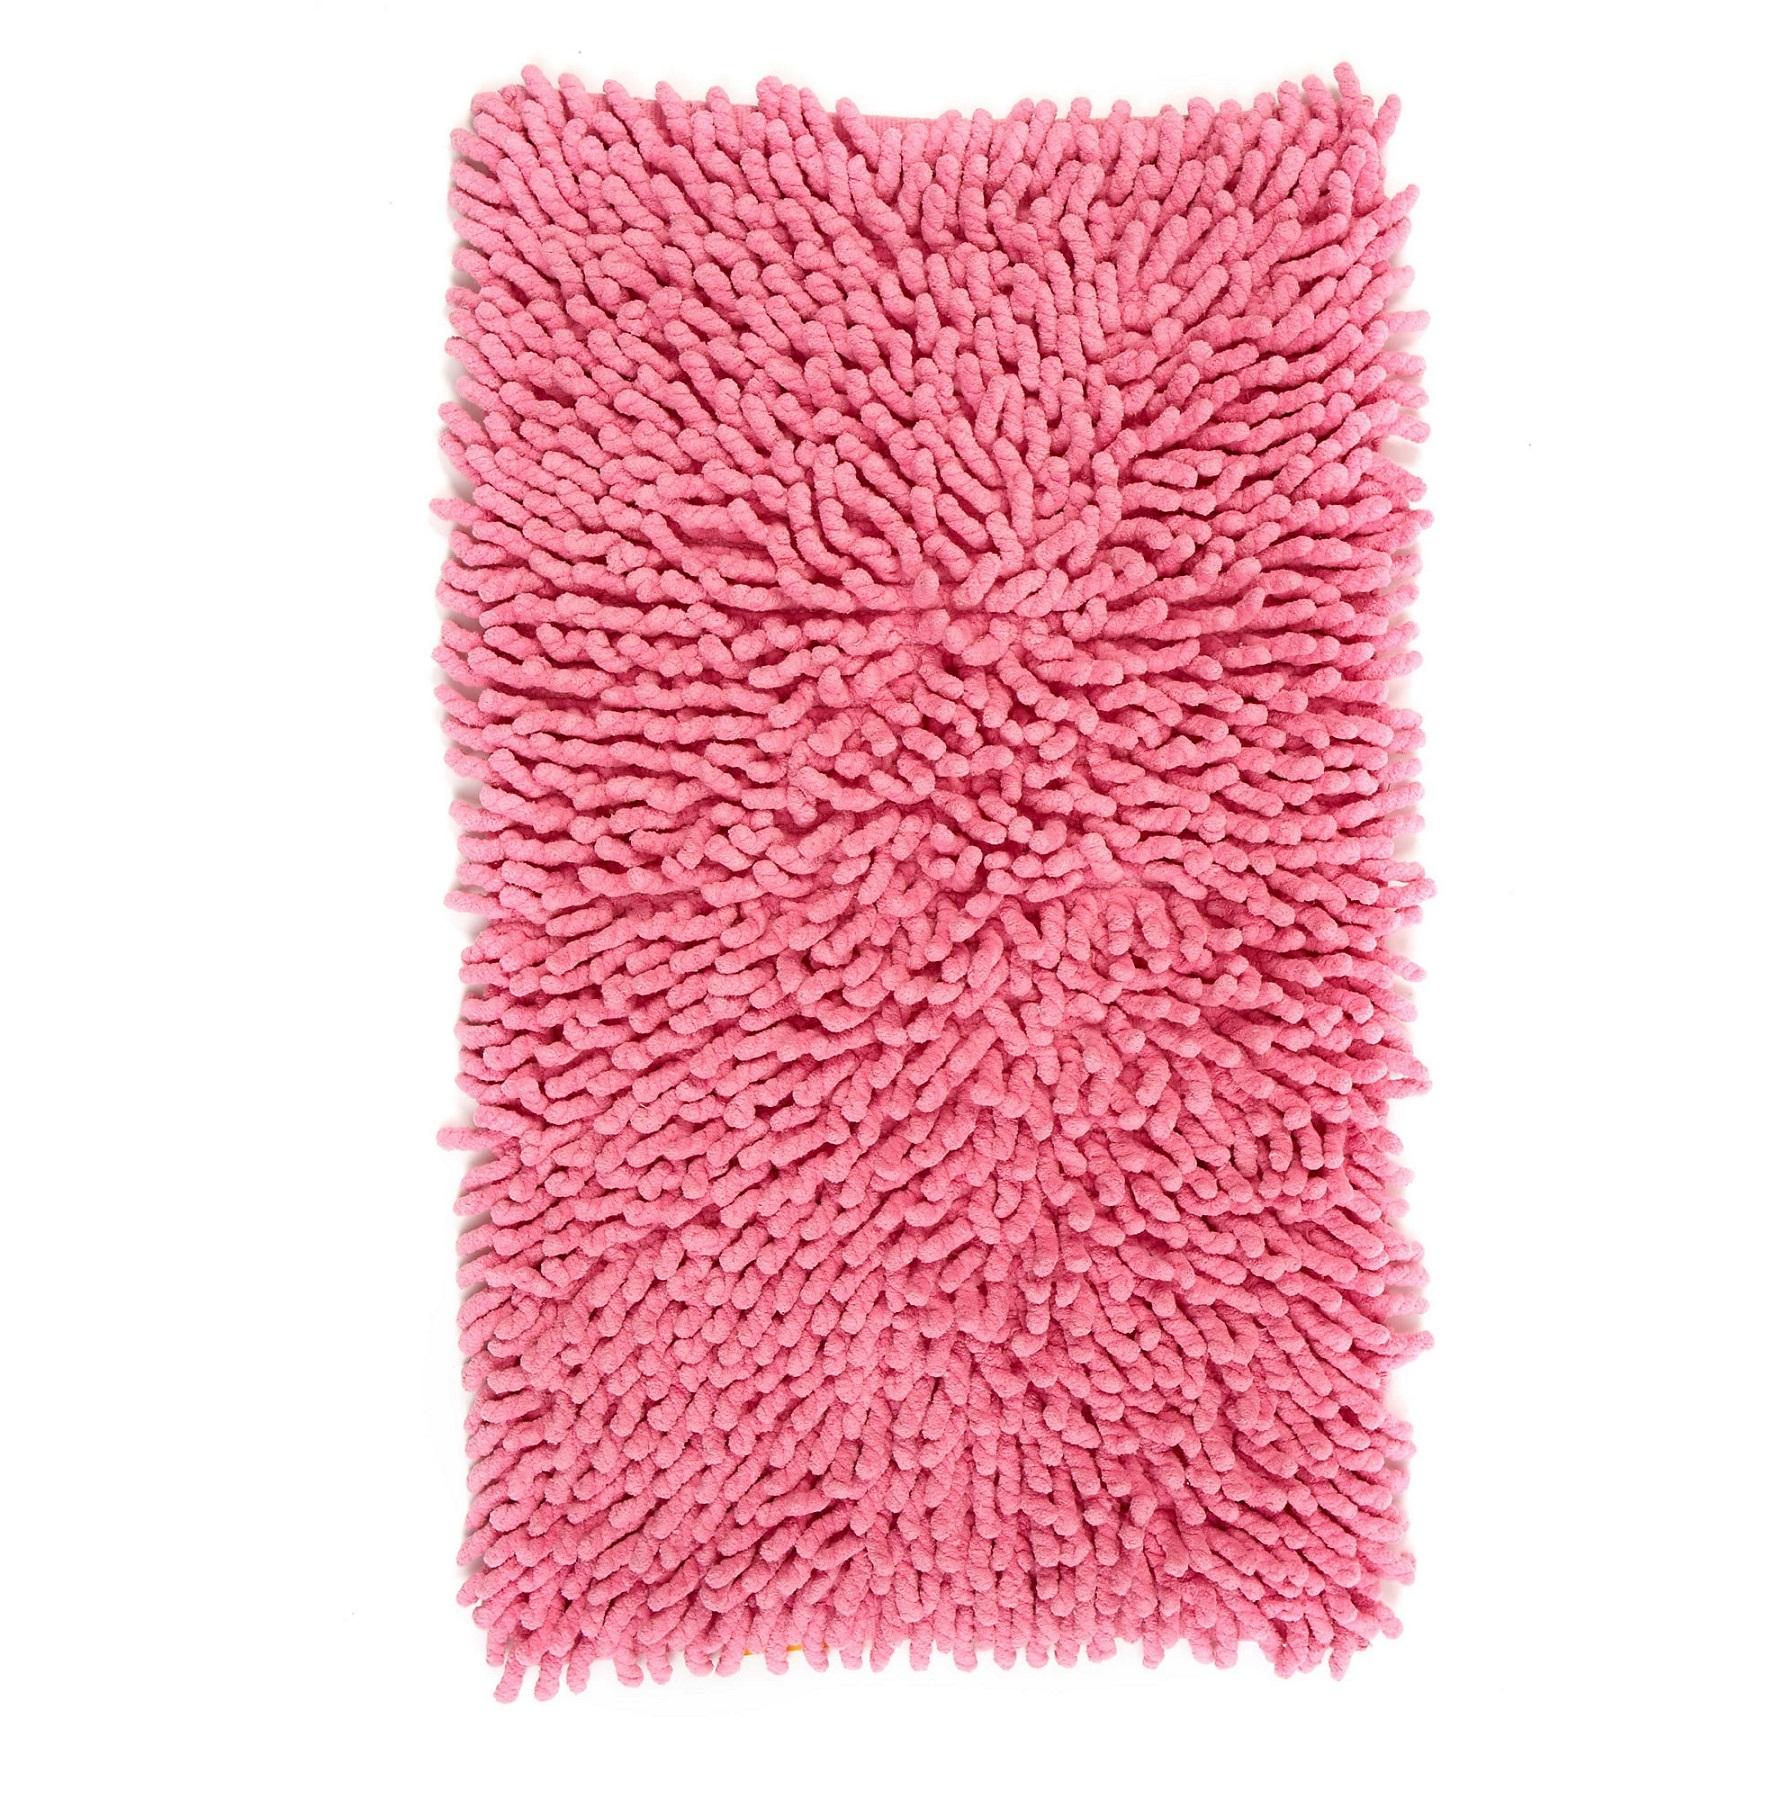 Коврики для ванной Коврик для ванной 51x81 Kassatex Basics Pink elitnyy-kovrik-dlya-vannoy-basics-pink-ot-kassatex-portugaliya.jpg